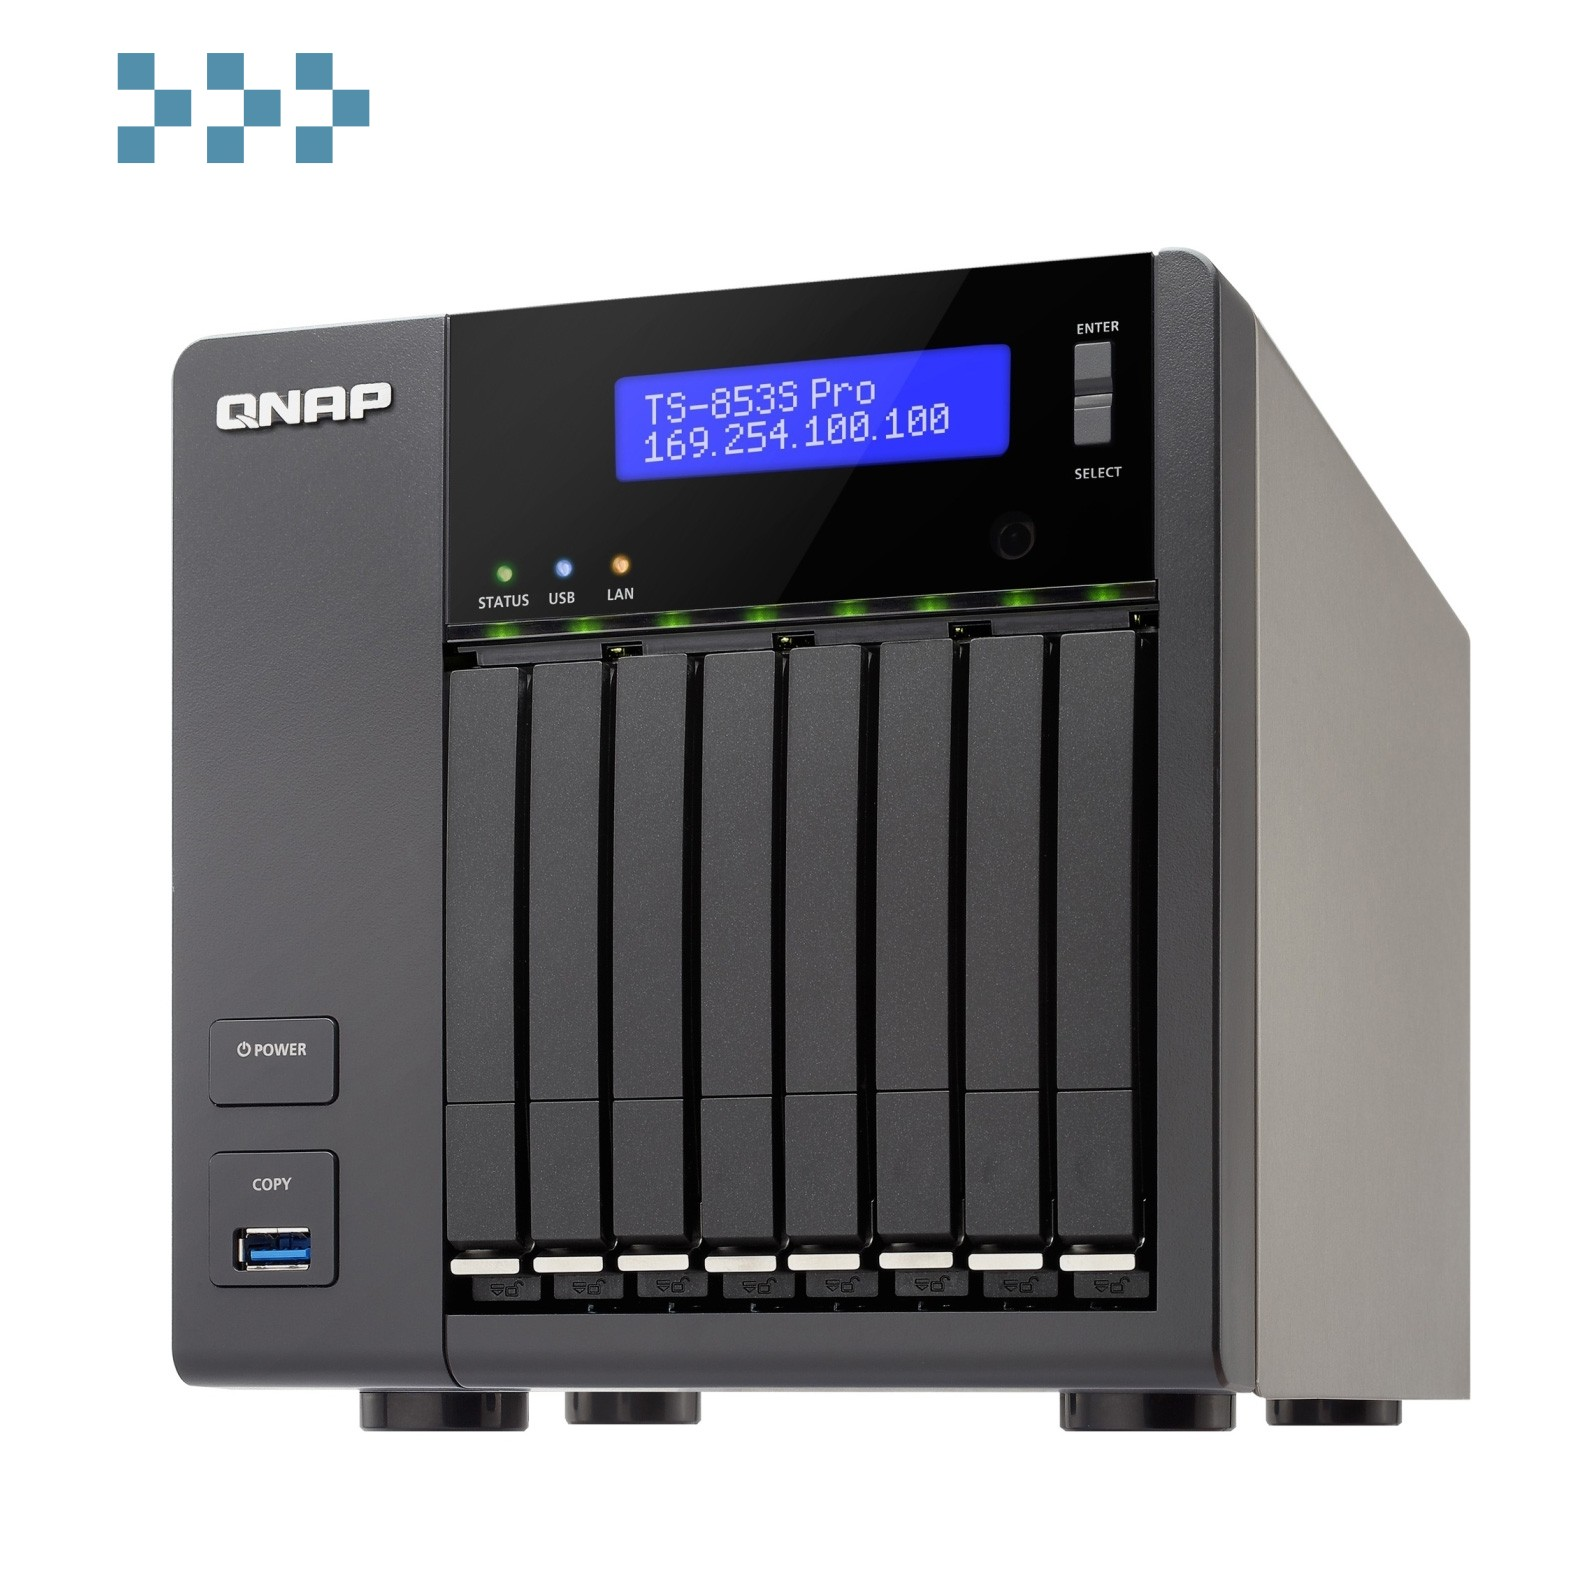 Сетевой накопитель QNAP TS-853S Pro